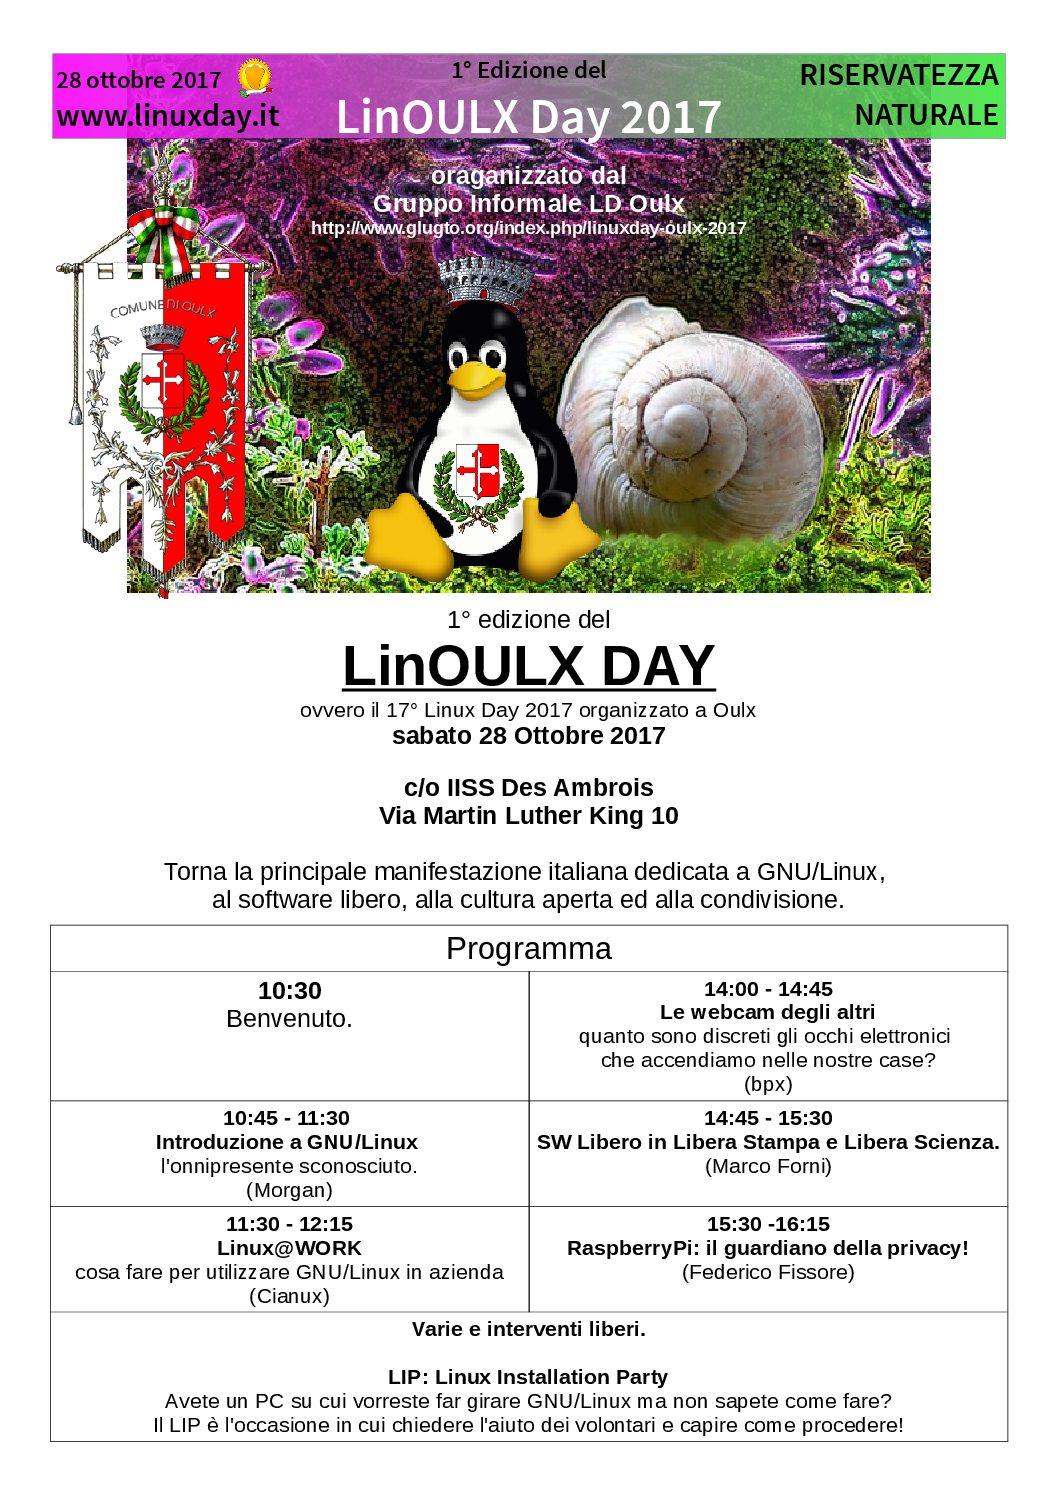 LinOULX DAY